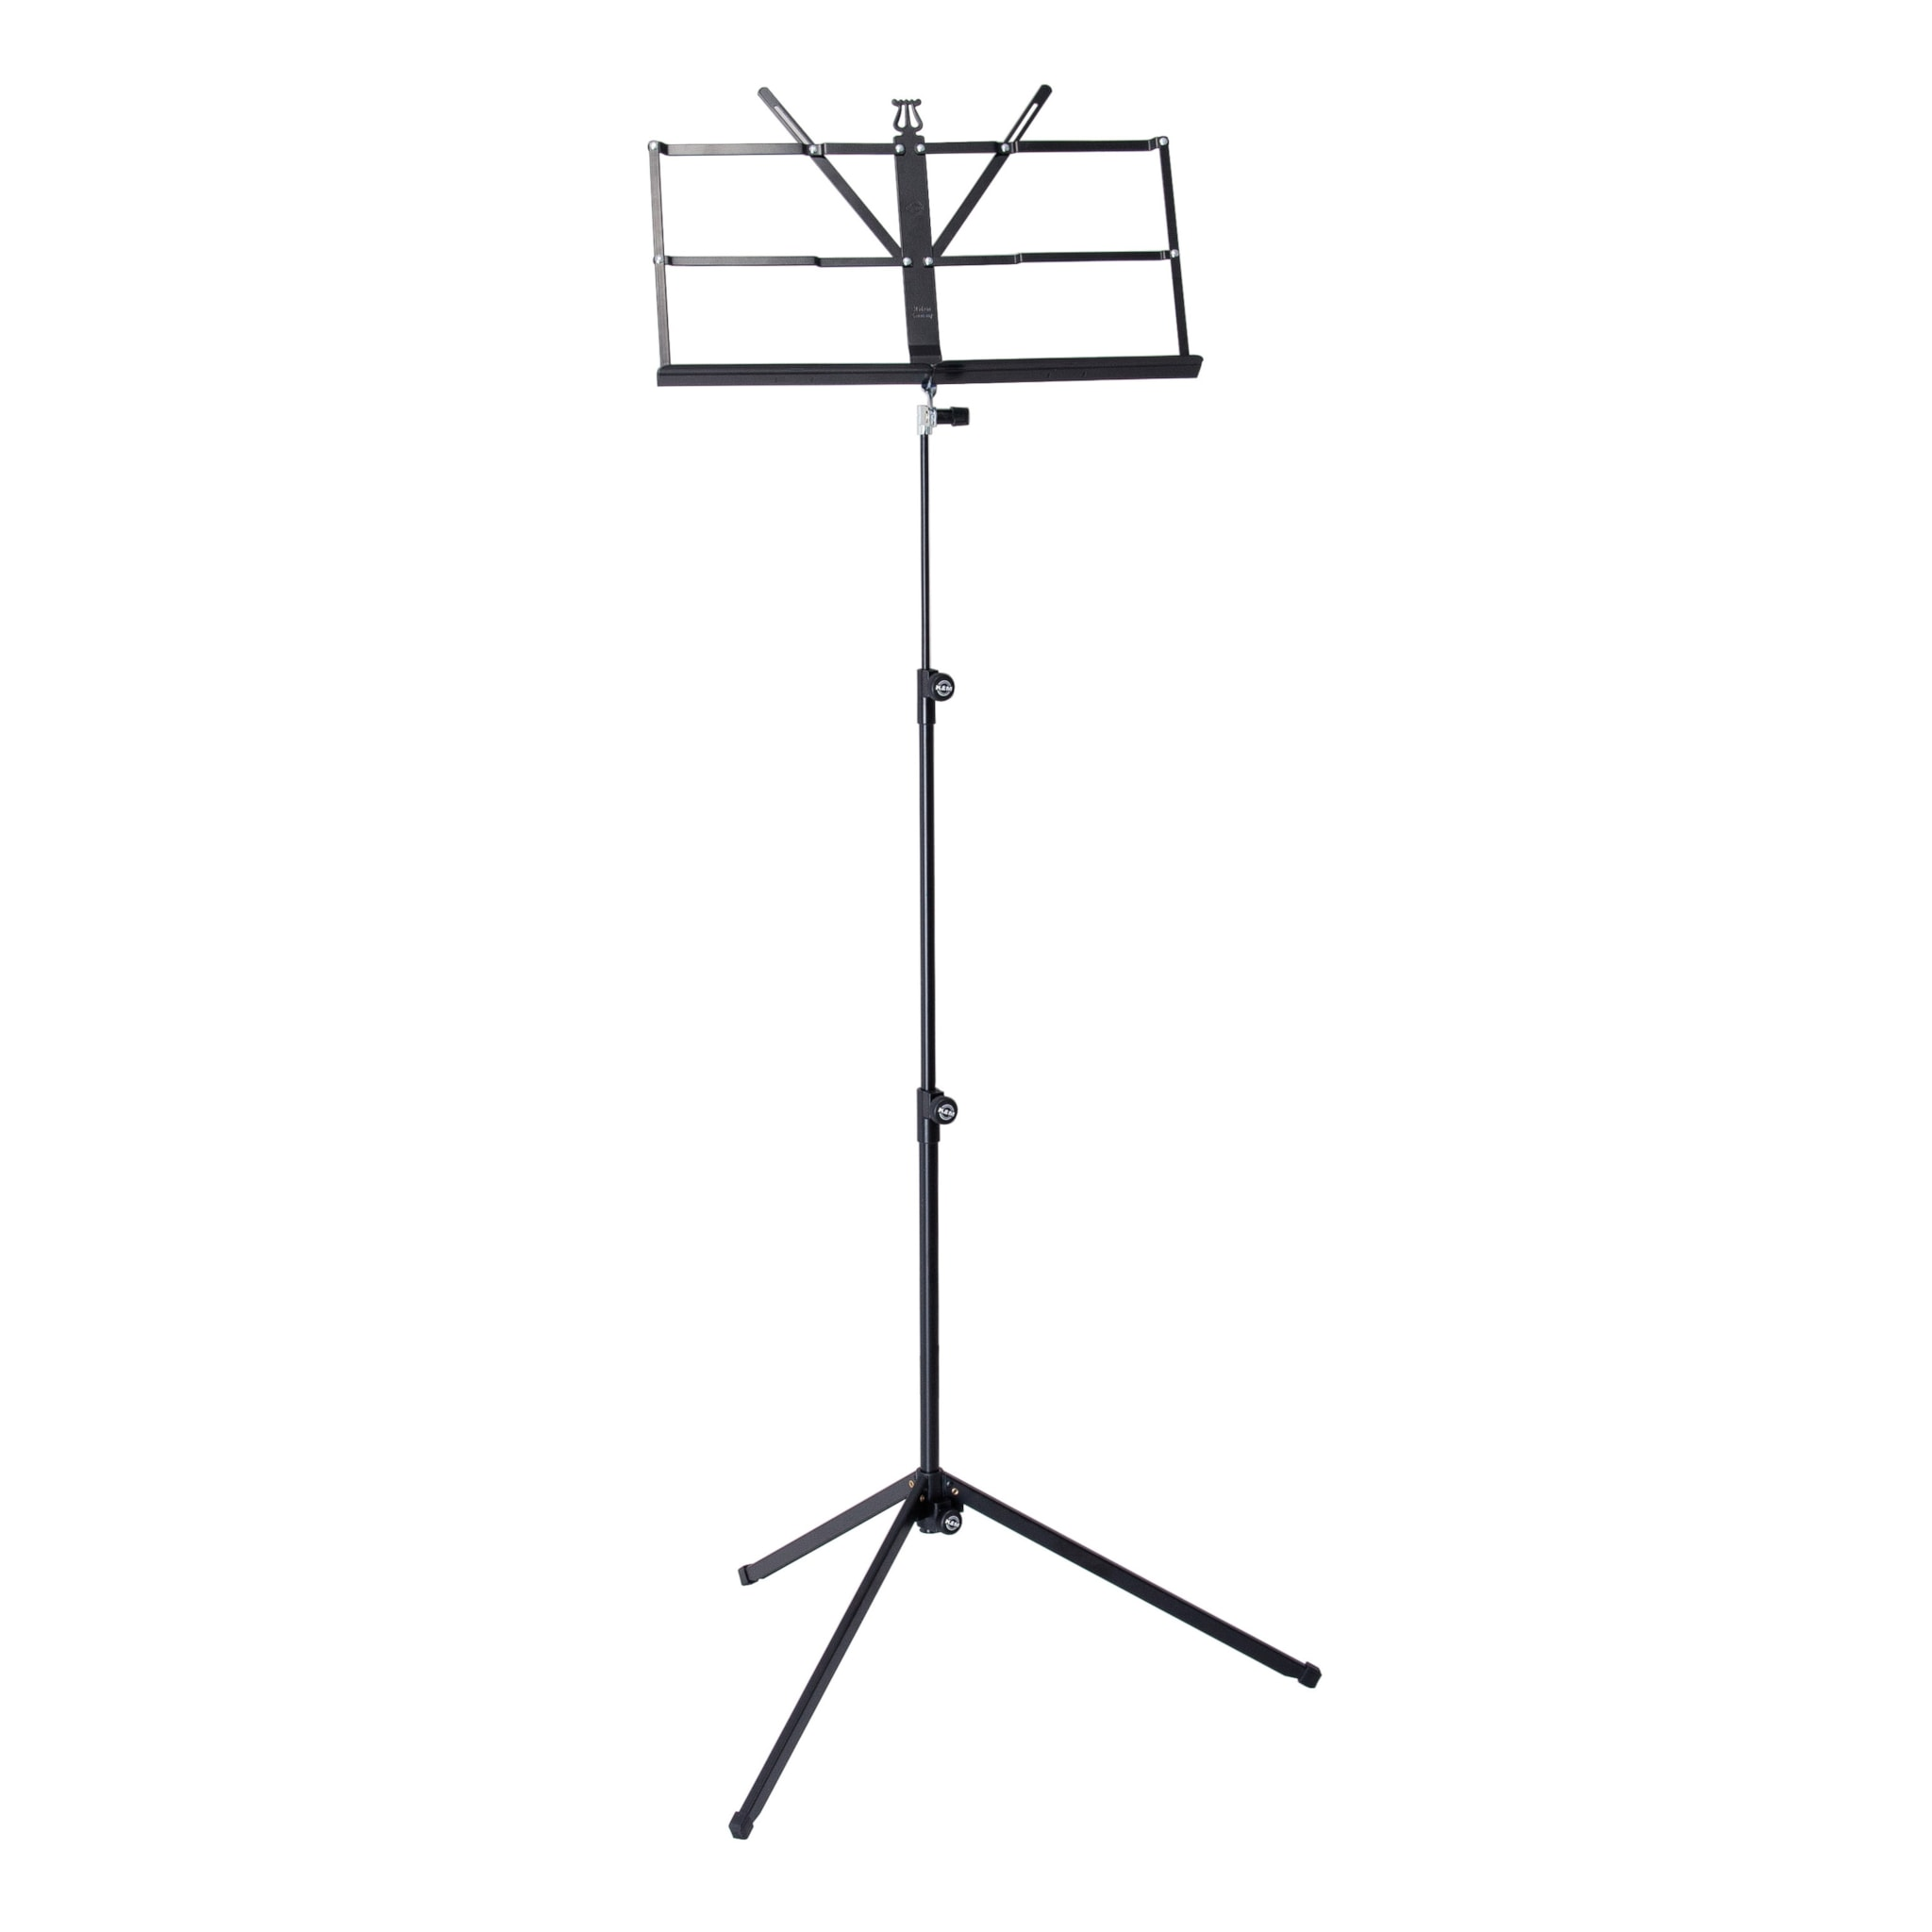 KM10040 - Music stand